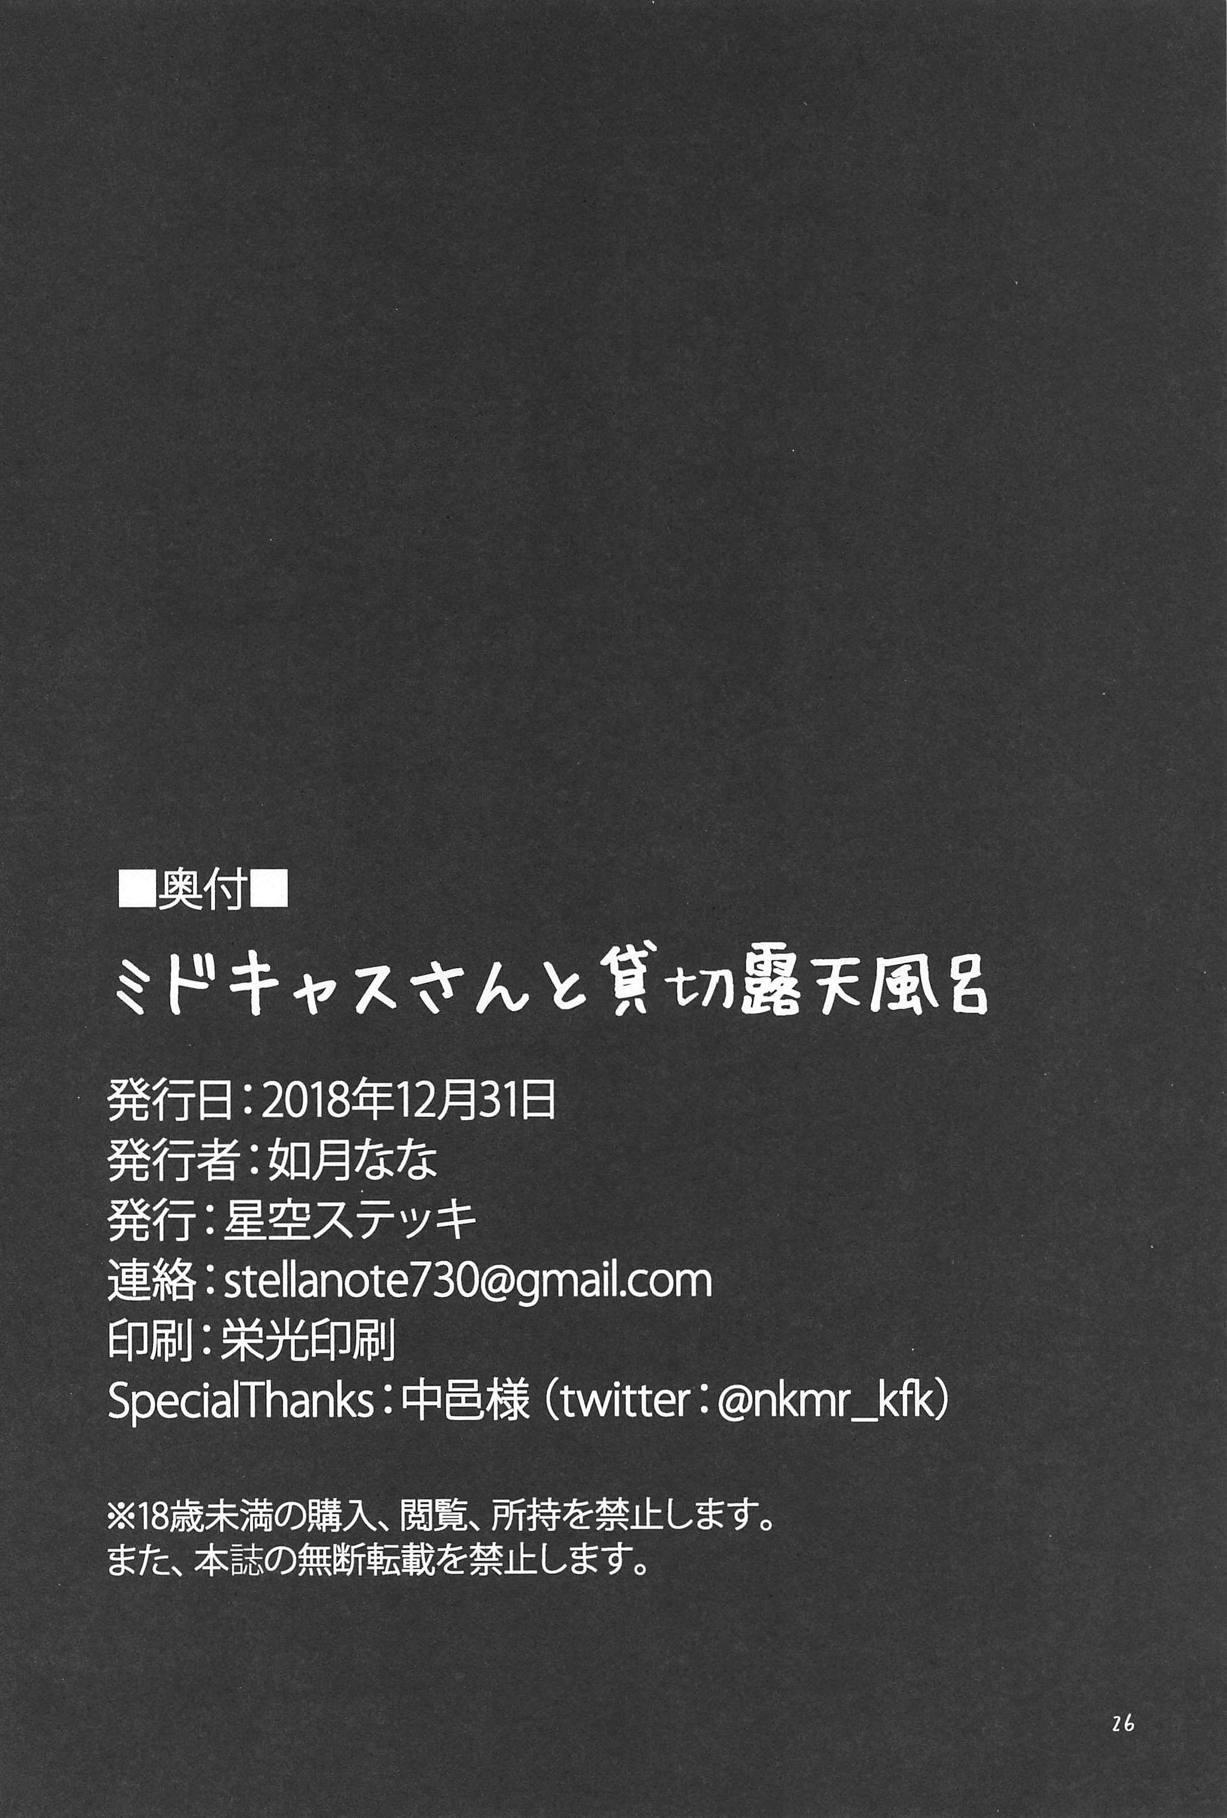 MidCas-san to Kashikiri Rotenburo 24